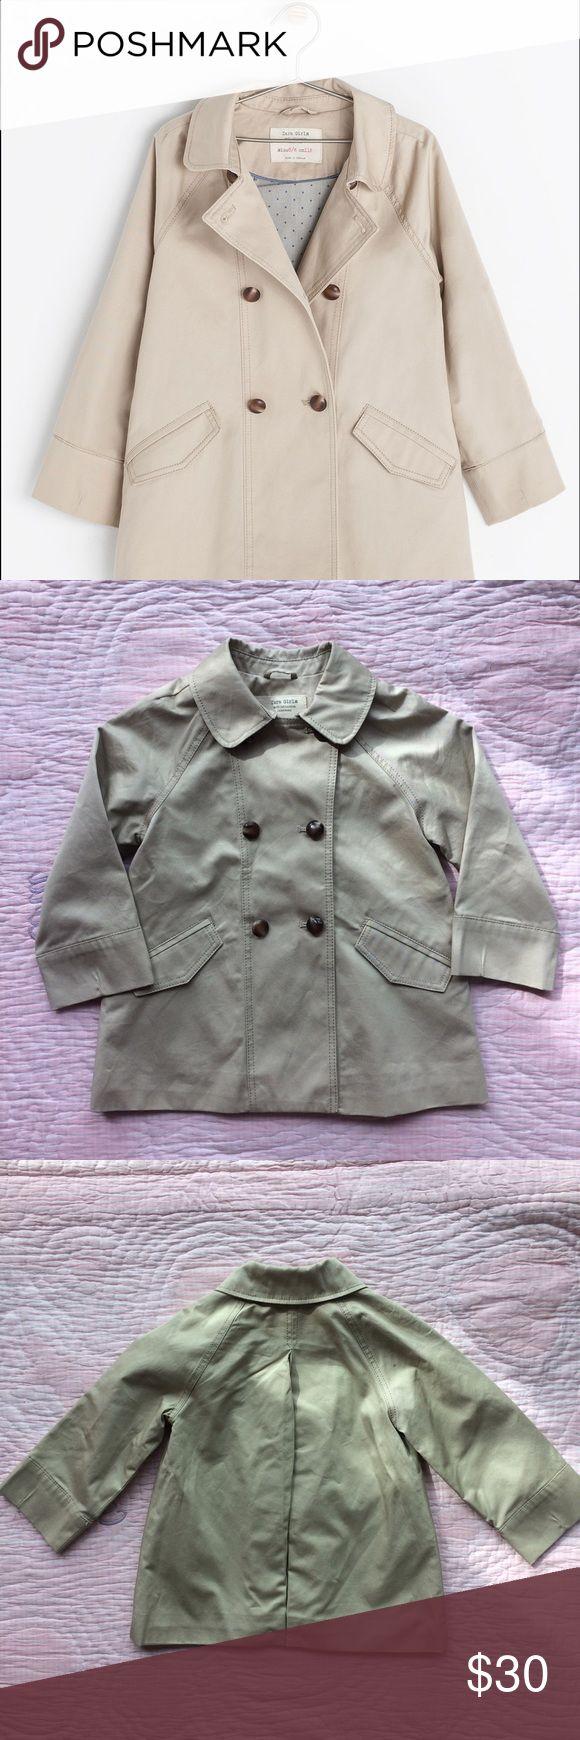 Zara girl trench coat Beautiful trench coat by Zara. Size 3/4 years. Excellent condition, as new. Zara Jackets & Coats Pea Coats